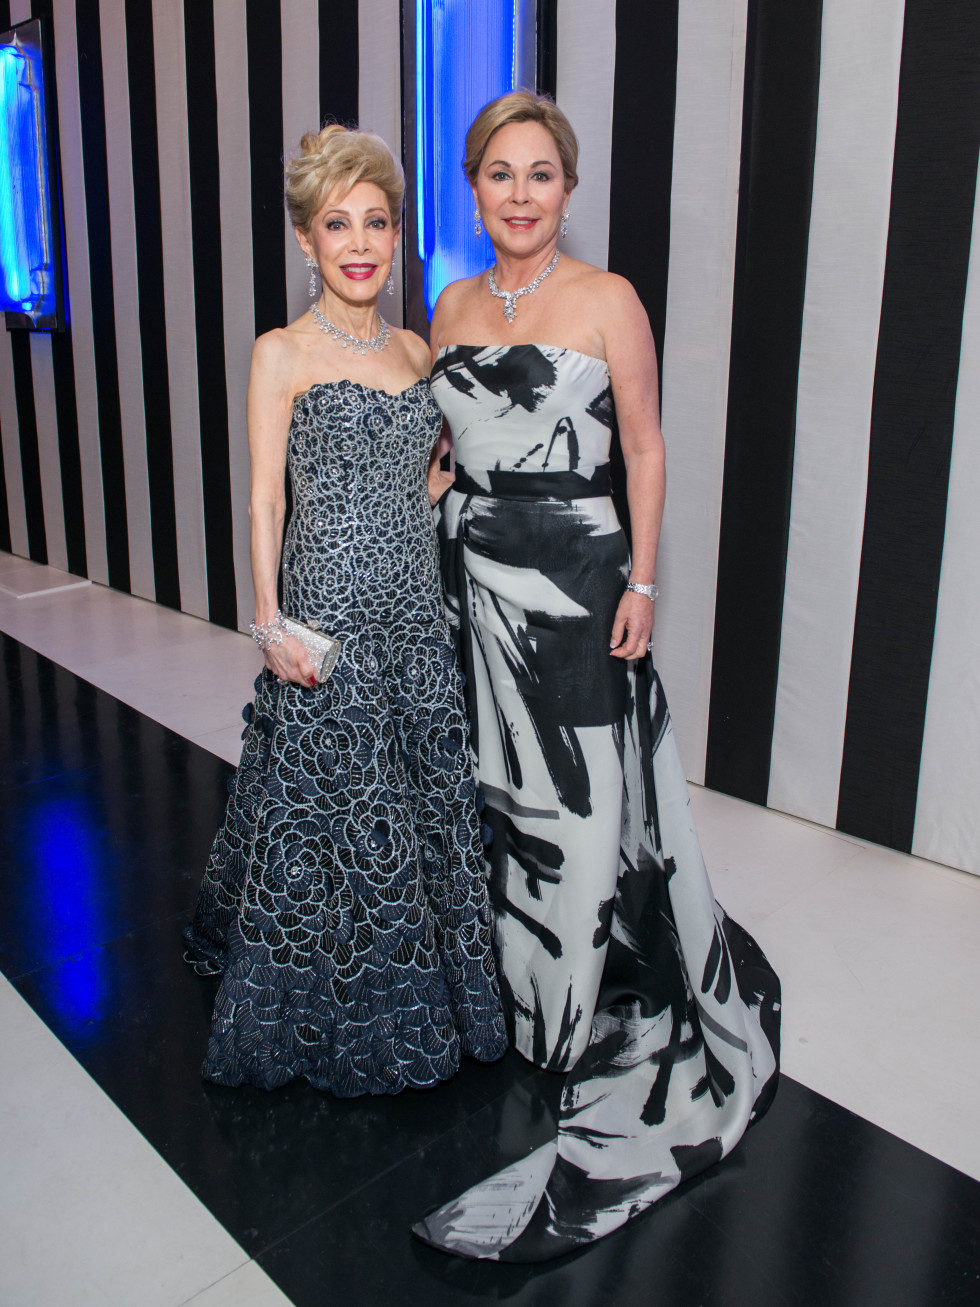 News, Shelby, MFAH gala gowns, Oct. 2015 Margaret Williams in Carolina Herrera, Nancy Kinder in Rueben Singer